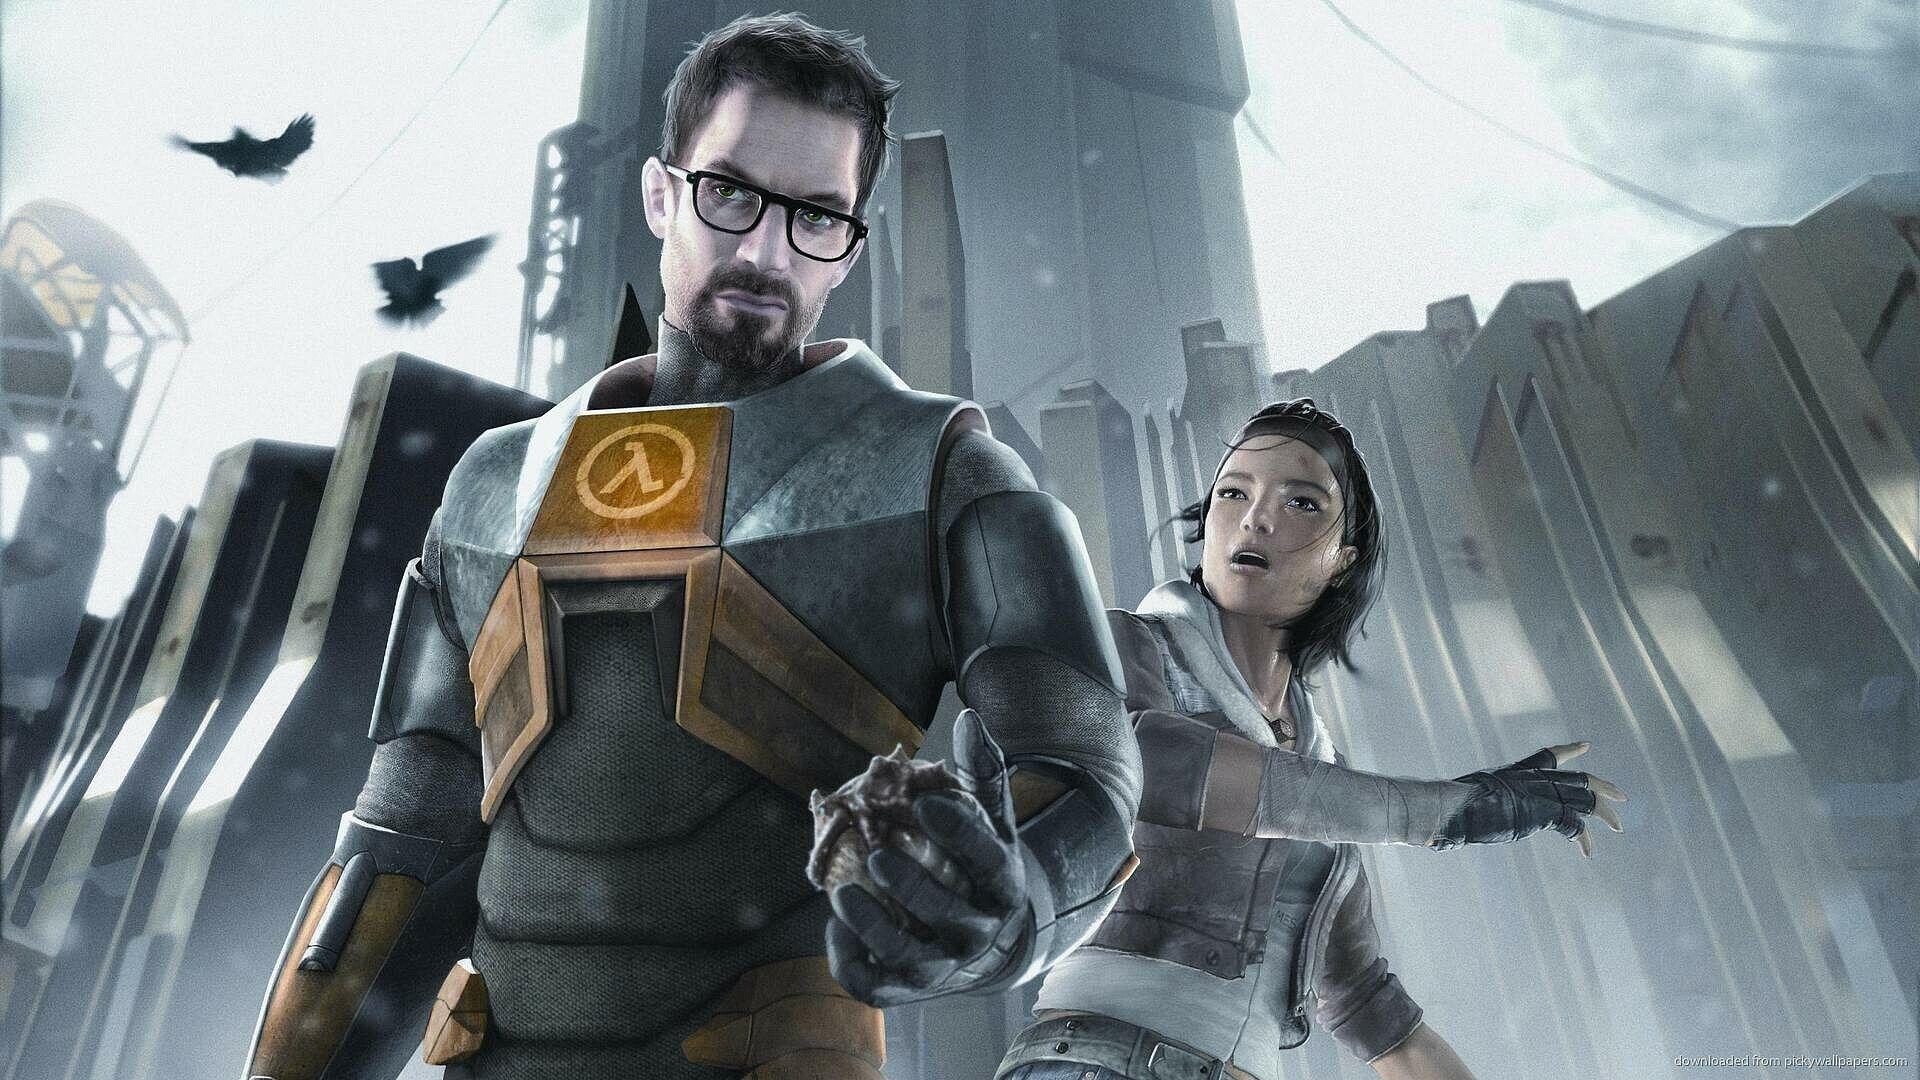 Valve bestätigt Half Life für VR – Half Life: Alyx offiziell angekündigt